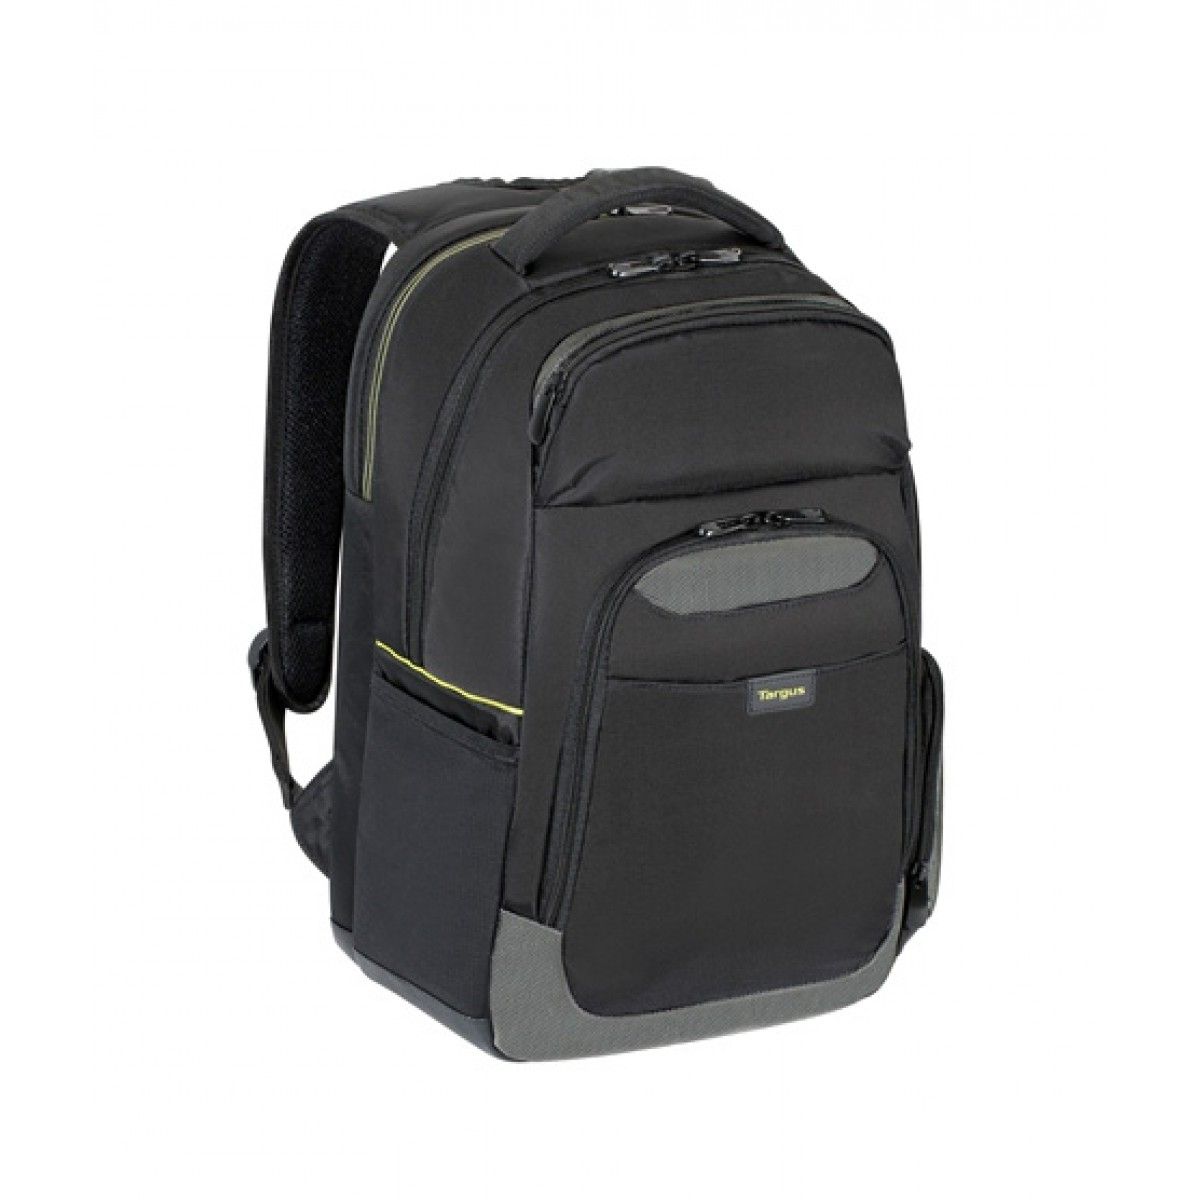 a67151e96c Targus Laptop Backpack Price- Fenix Toulouse Handball